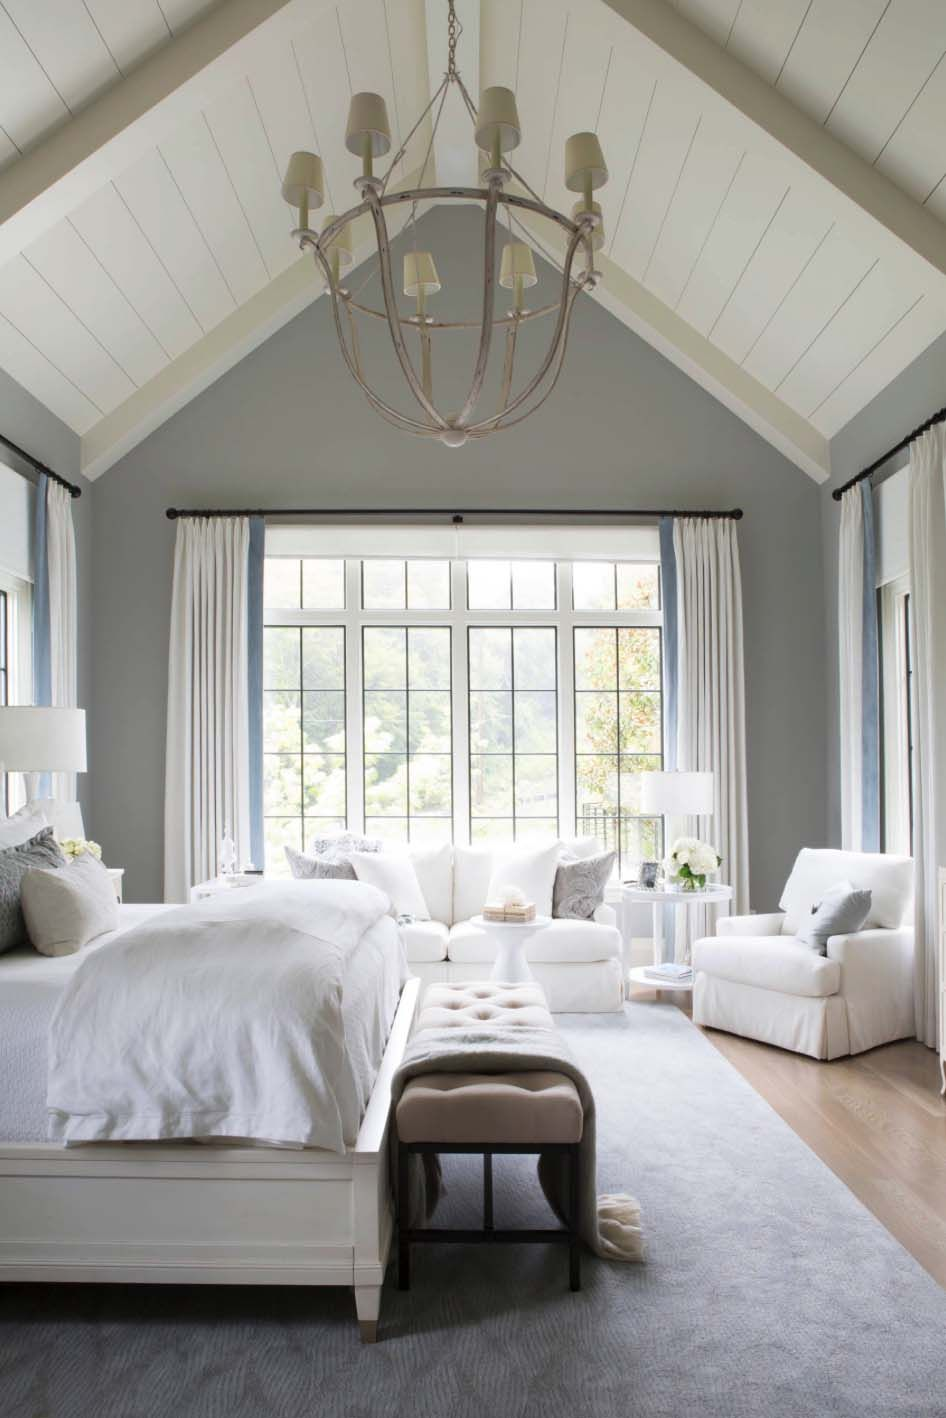 20 serene and elegant master bedroom decorating ideas on home interior design bedroom id=46645